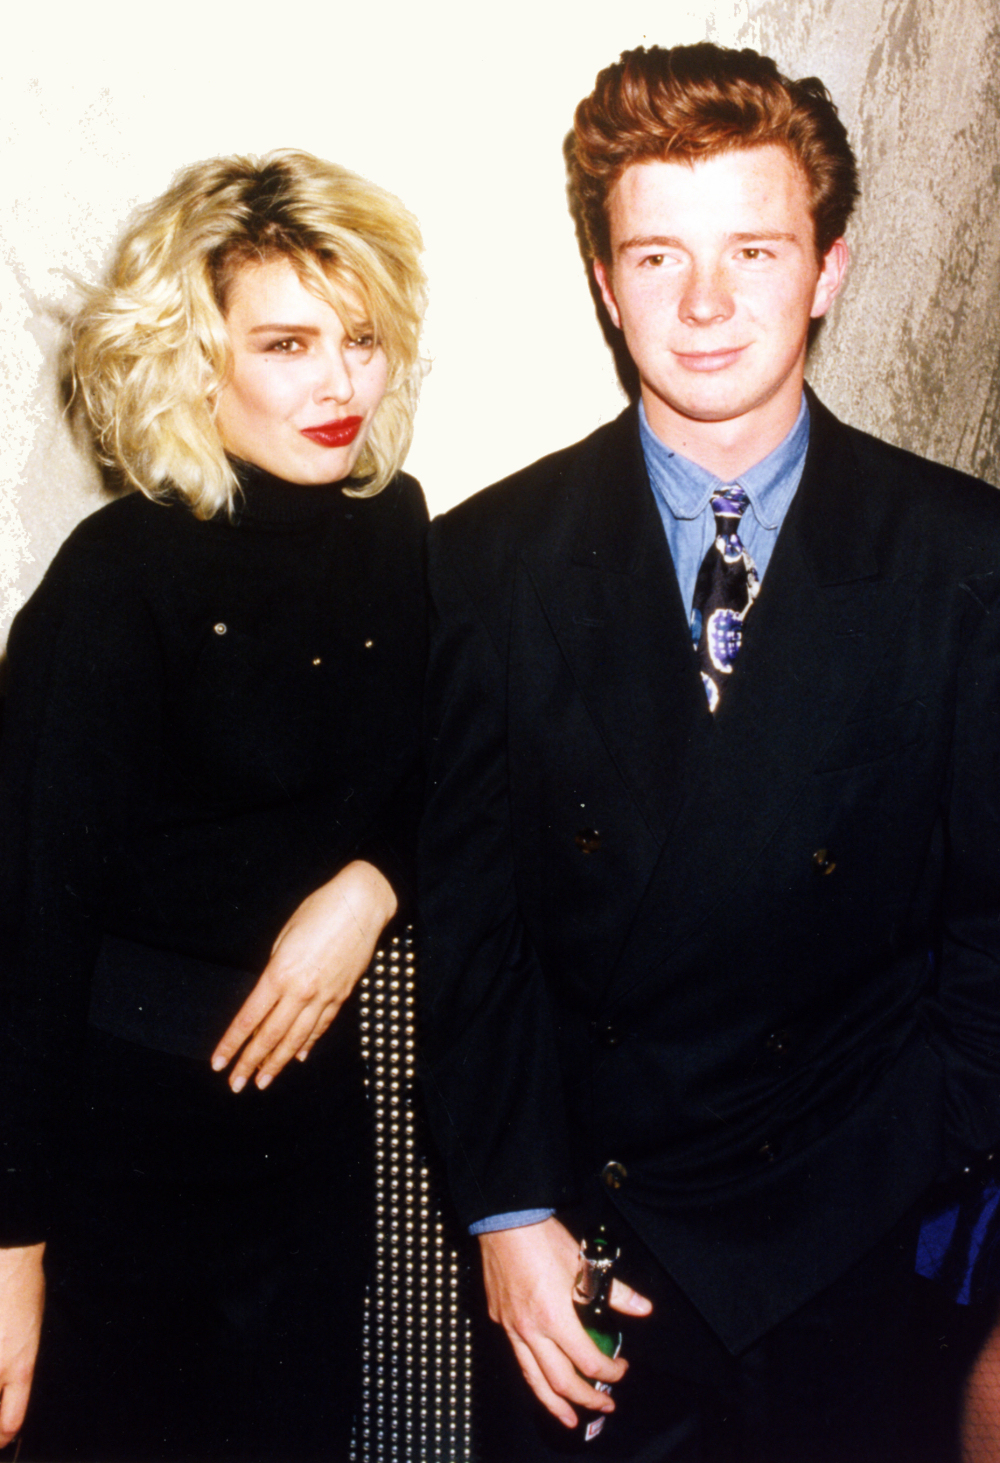 Samantha fox and john - 1 2